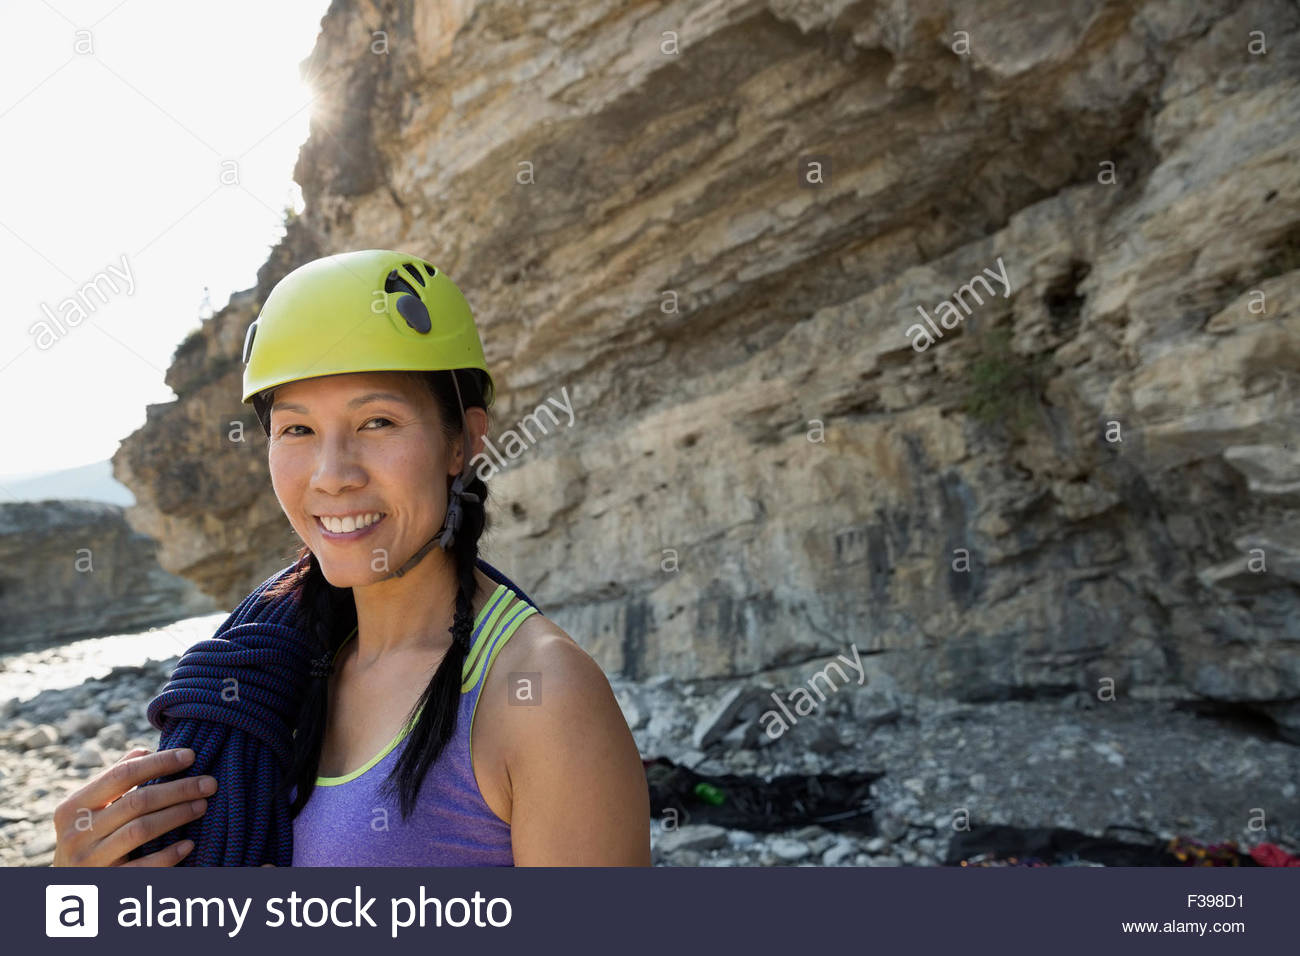 Portrait smiling female rock climber in helmet - Stock Image